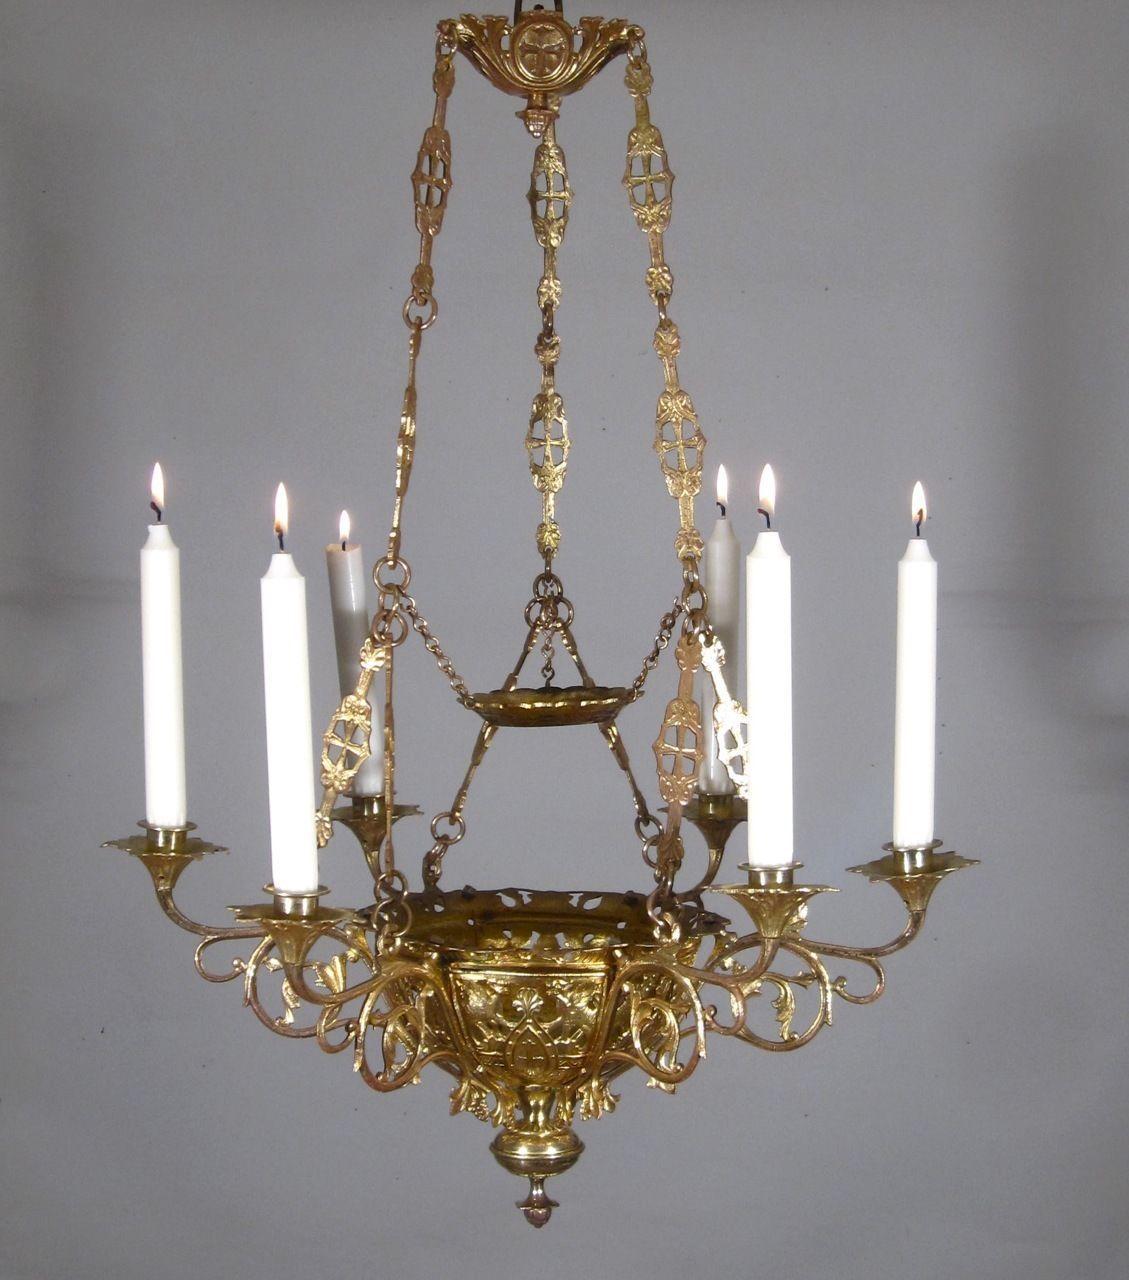 Bronze Antique Chandeliers, Fixtures & Sconces   eBay - Antique French Neo Romanesque Gilded Bronze Church Chandelier